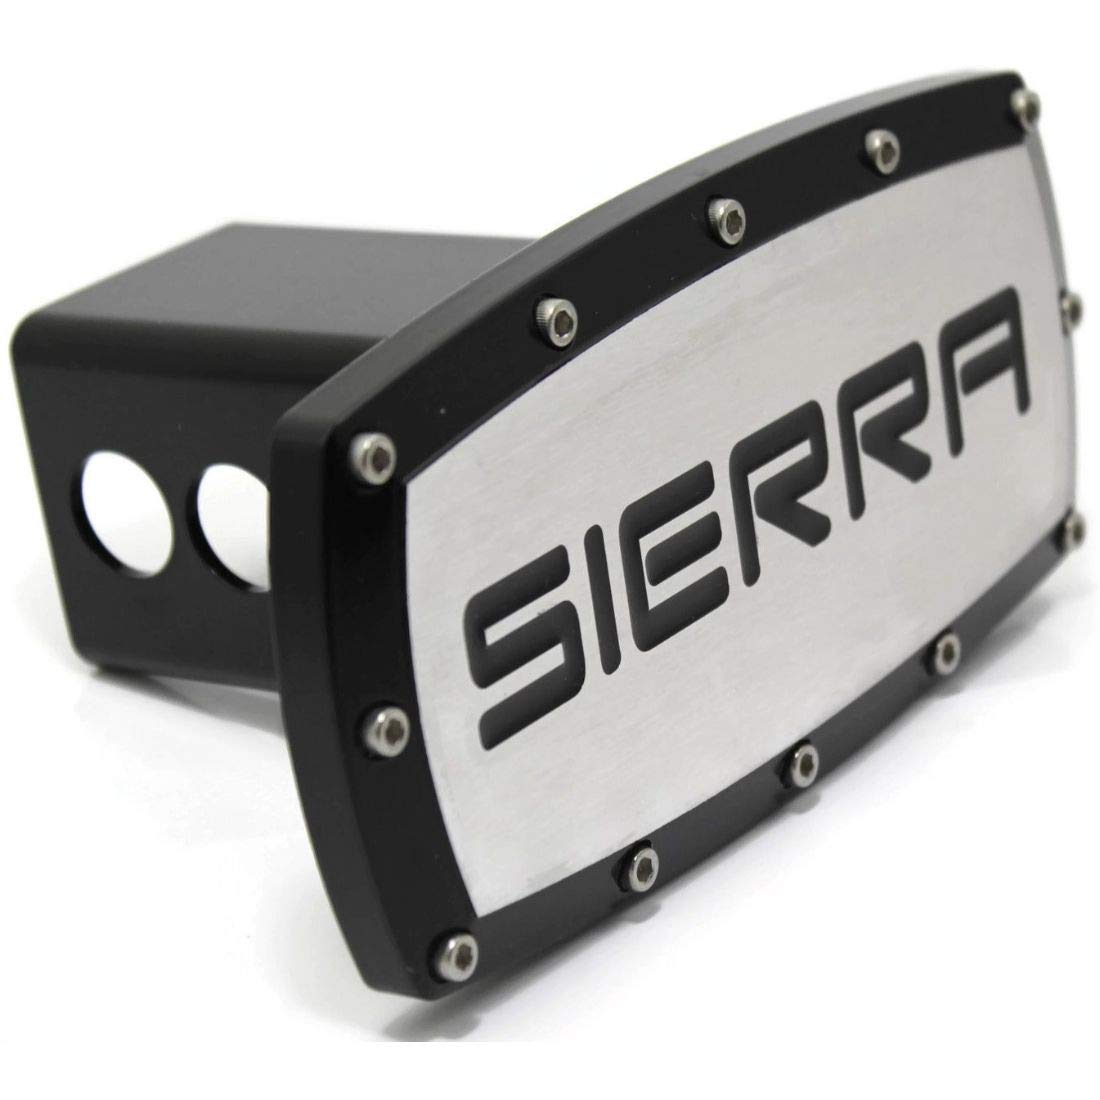 GMC Sierra Billet 2 Tow Hitch Cover Plug Engraved Billet Black Powder Coated